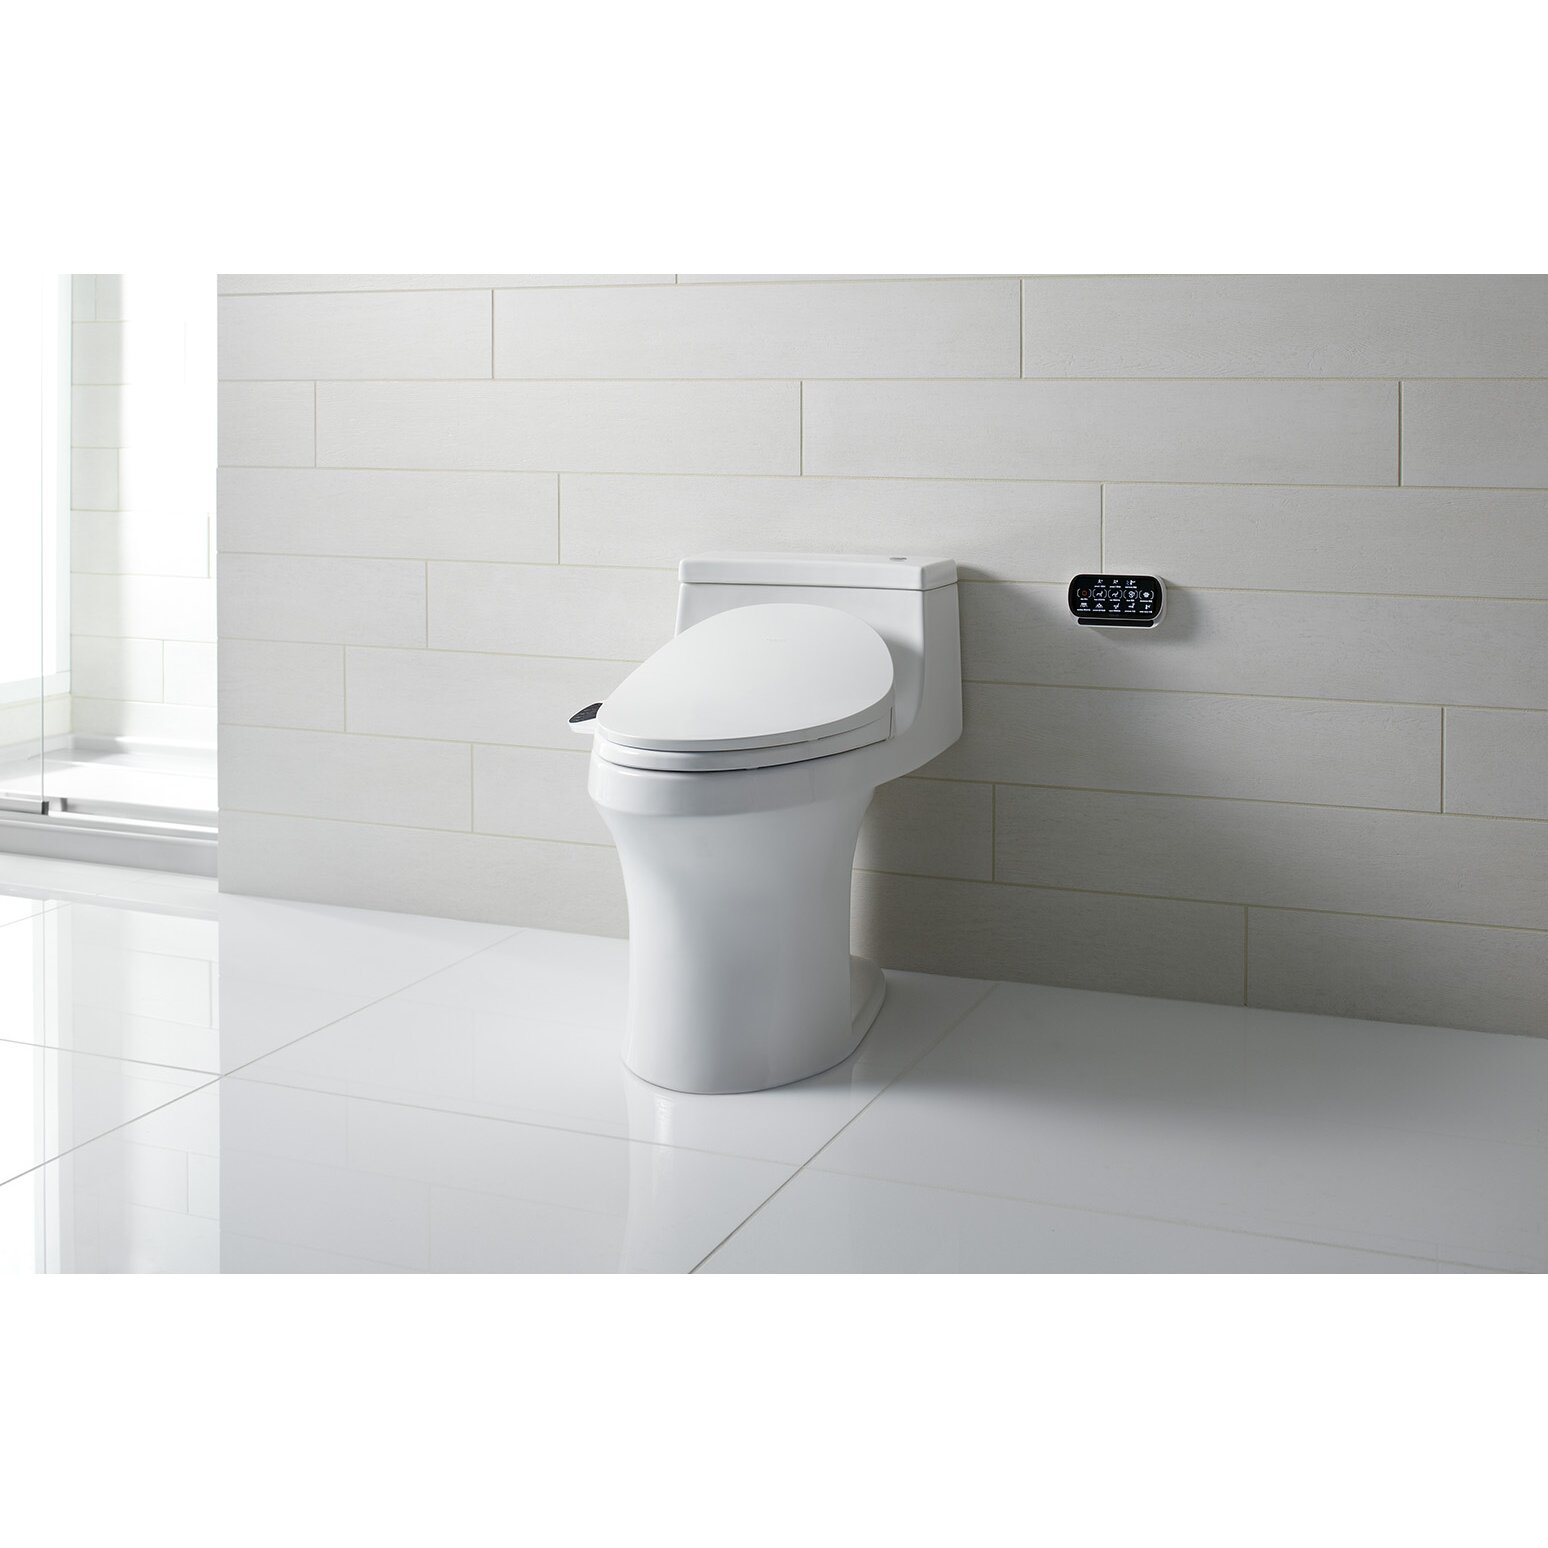 Kohler C3 230 Elongated Bidet Toilet Seat With In Line